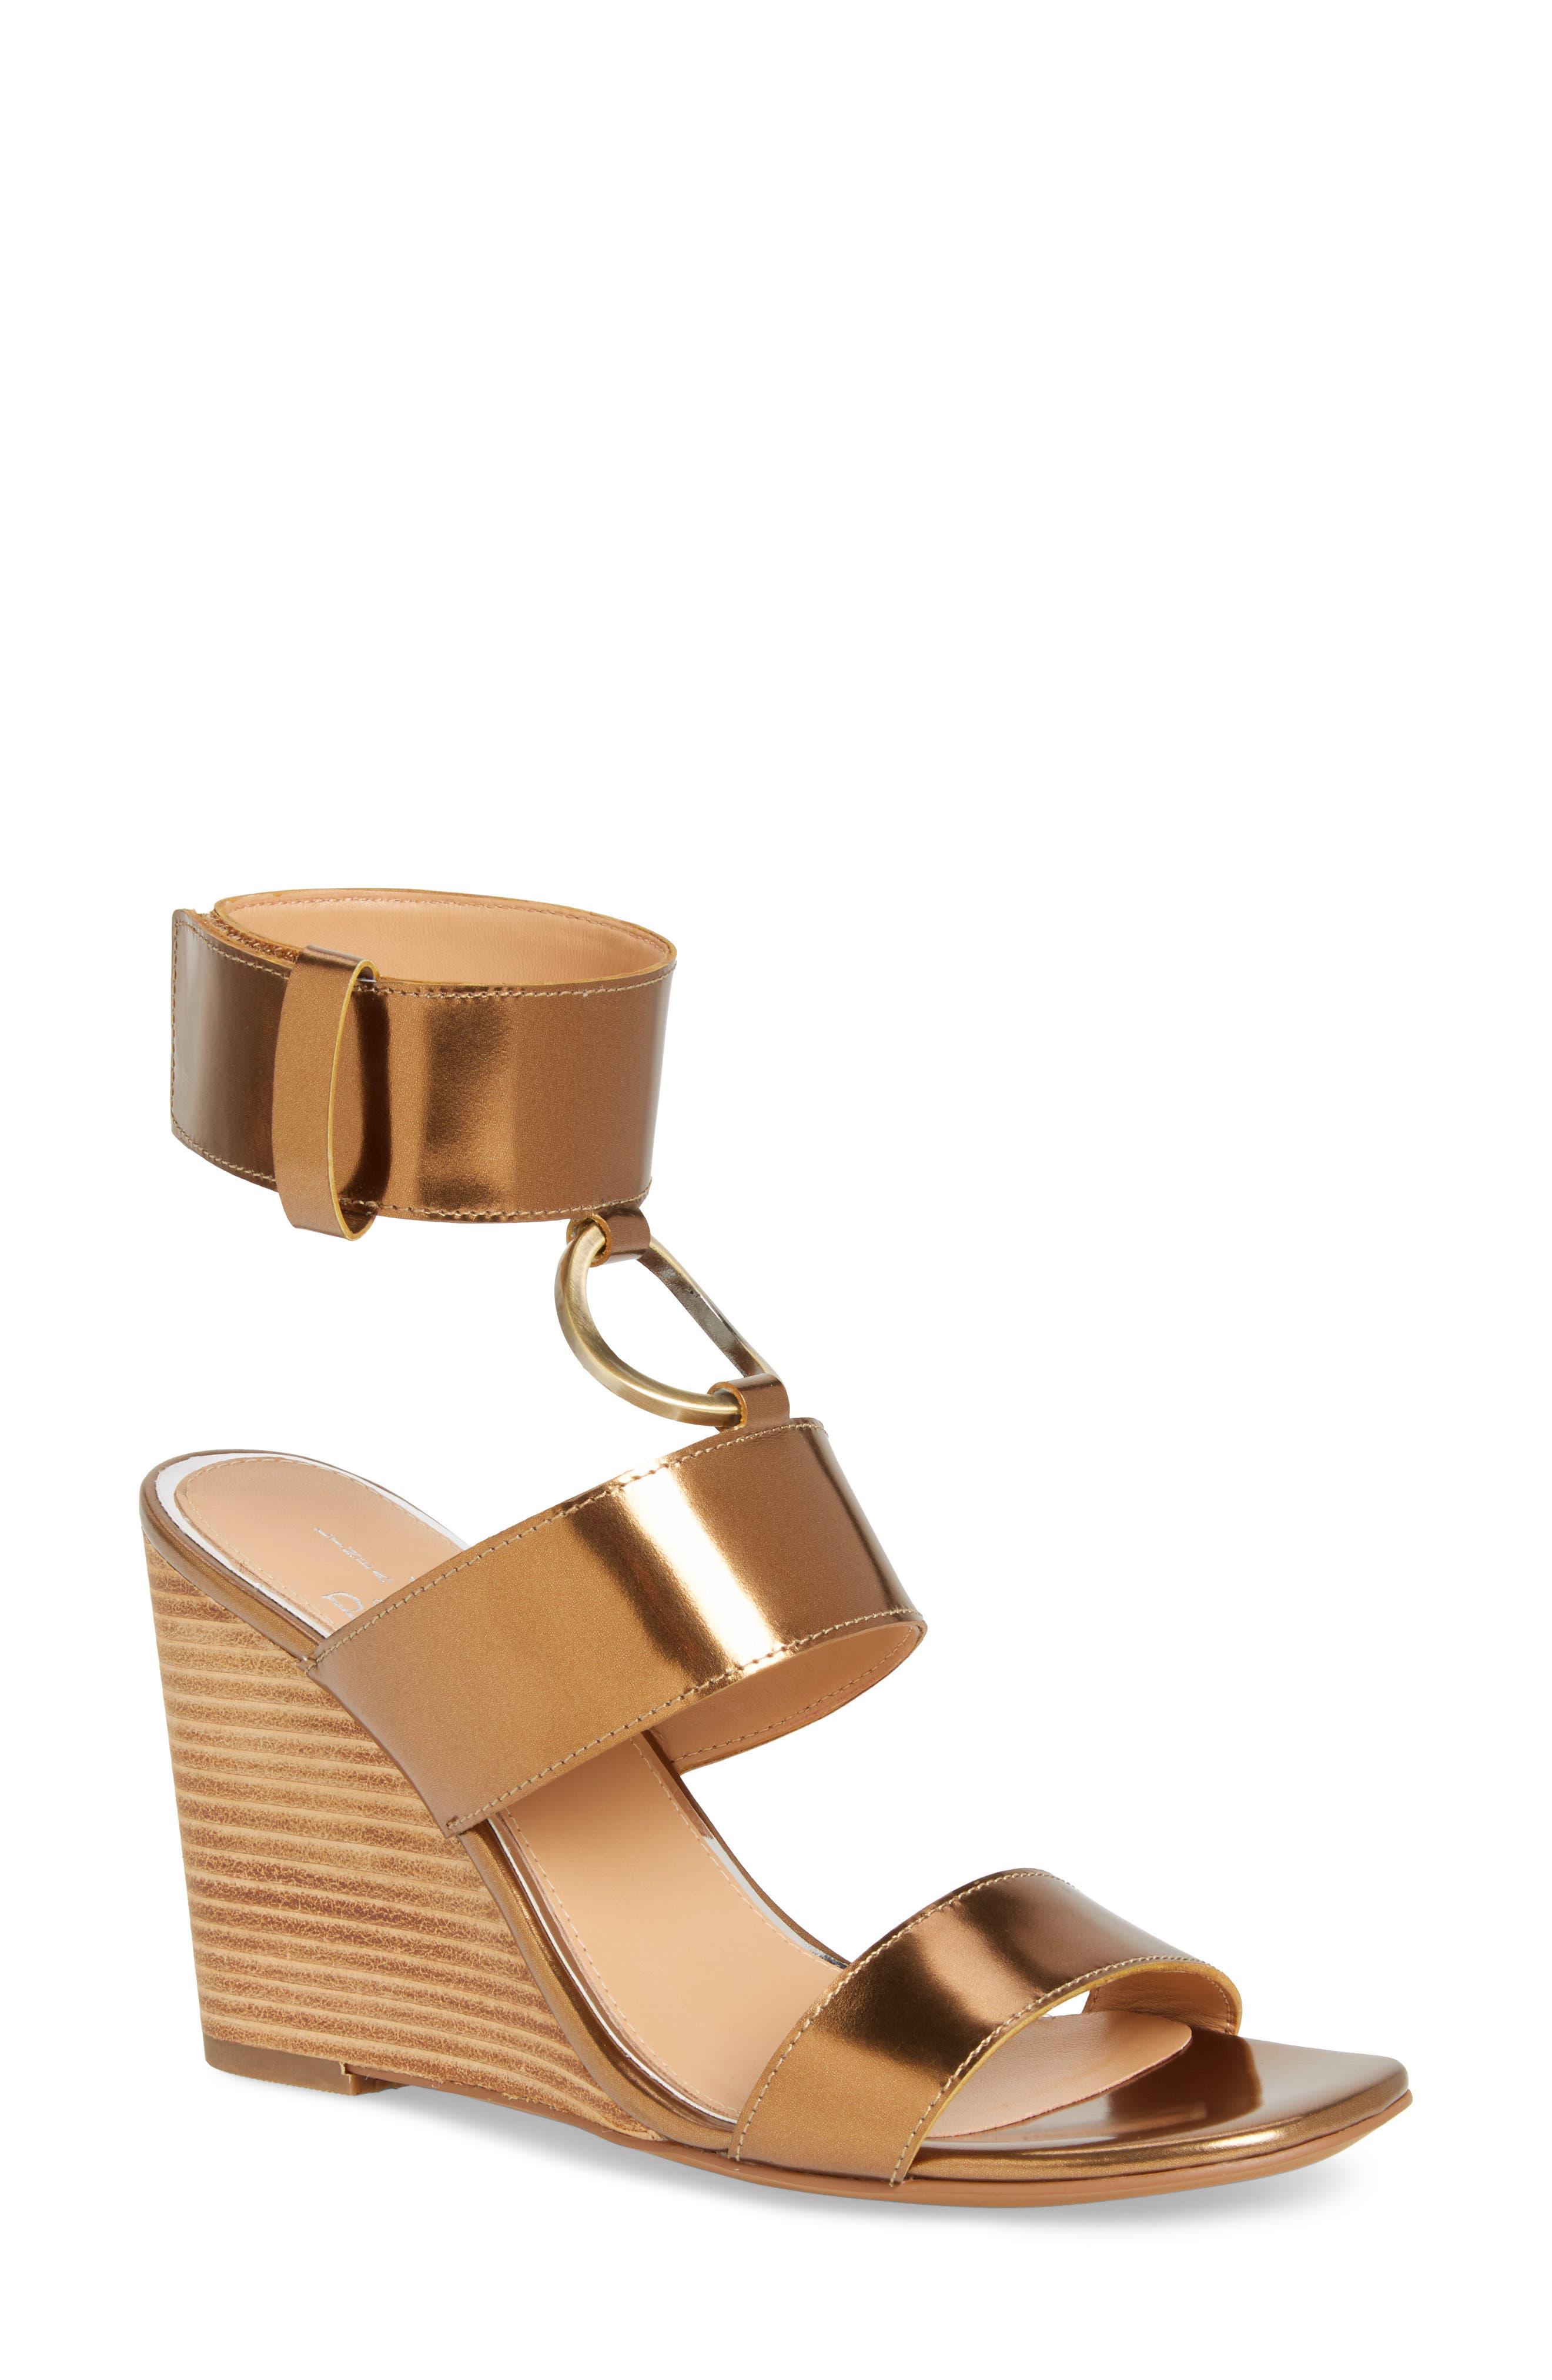 Linea Paolo Eva Wedge Sandal- Metallic